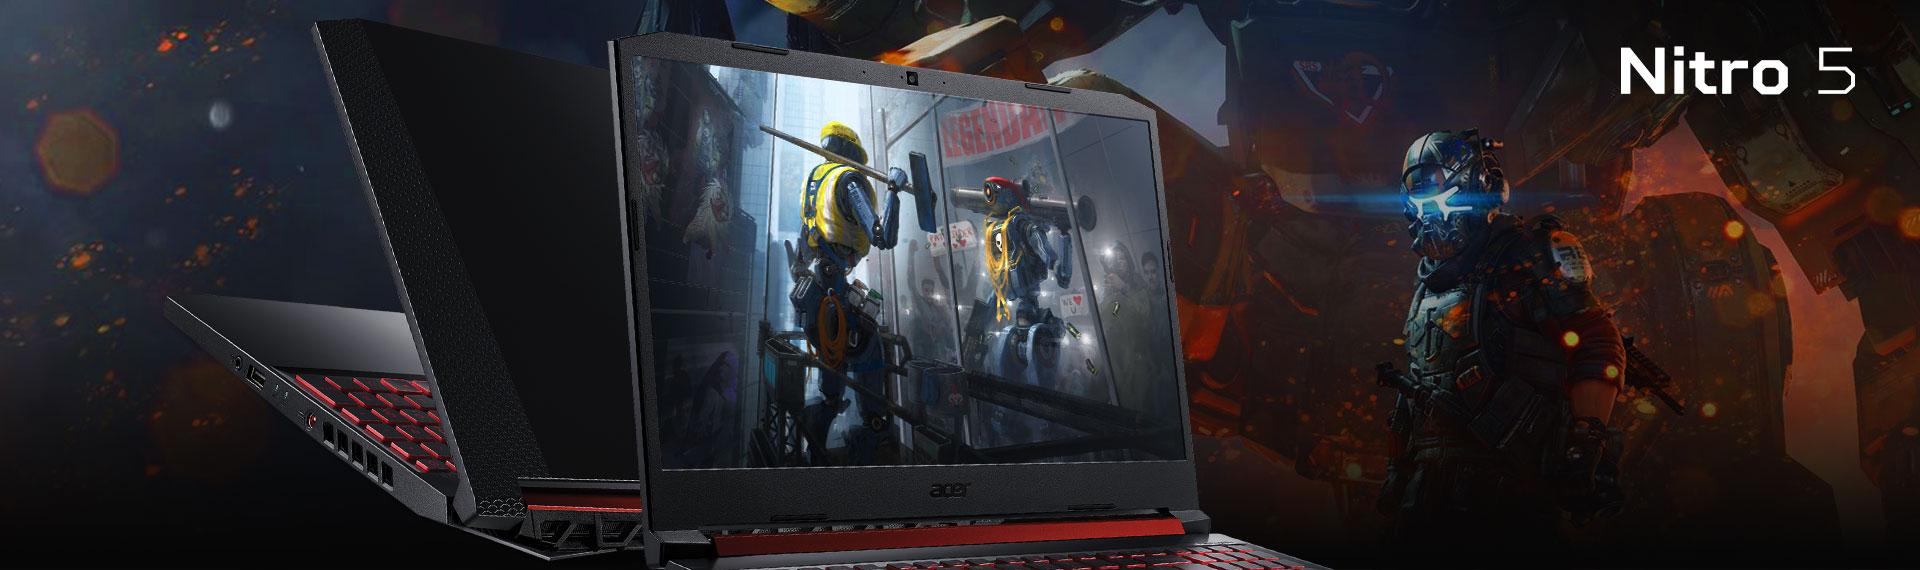 New Nitro 5 Intel 9th Gen Core i5, Berat Minim Berkapasitas Maksimal